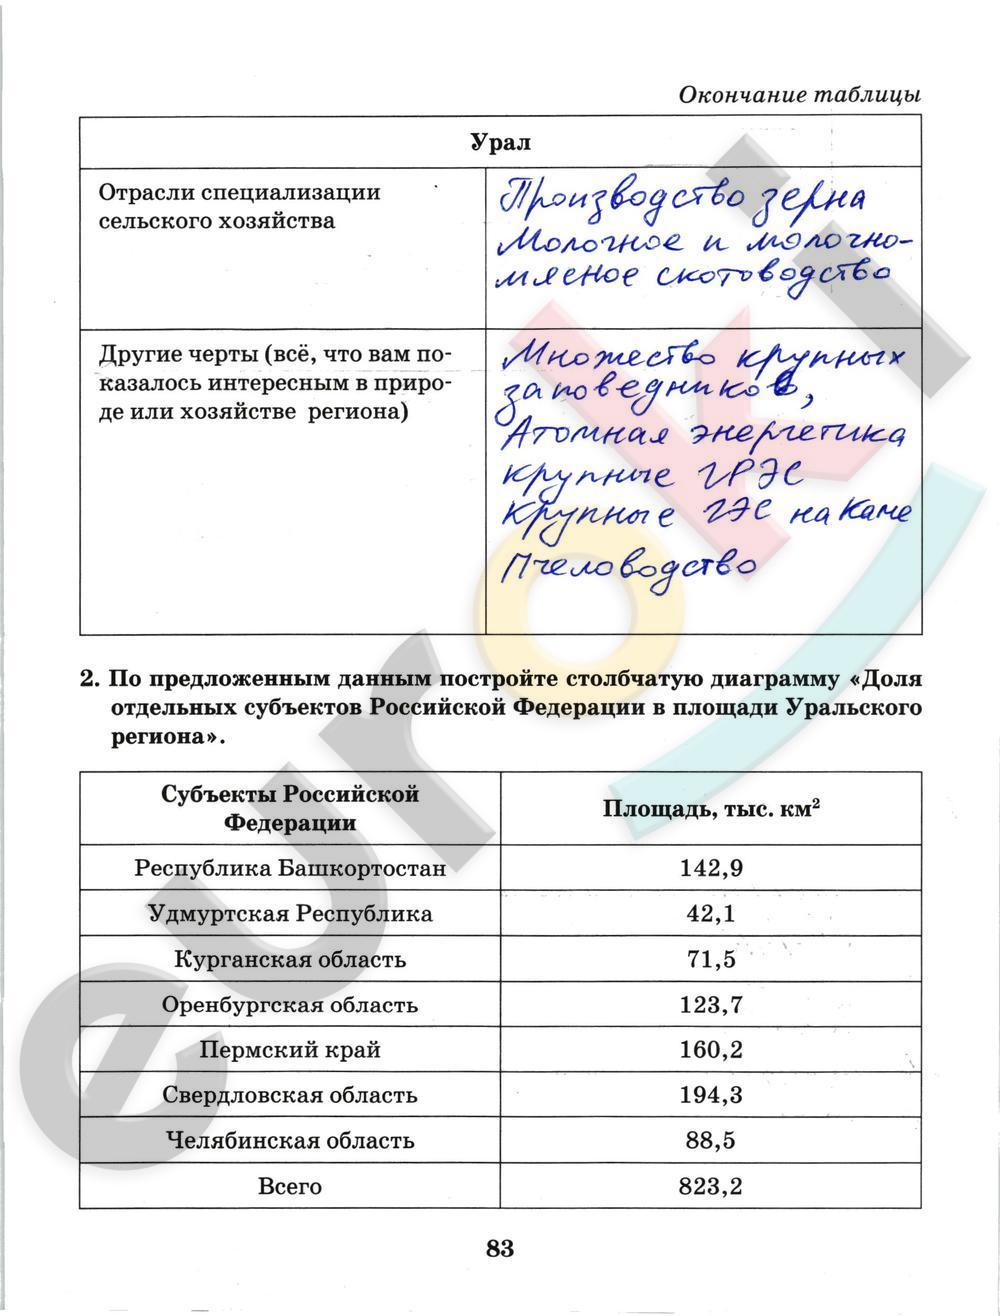 гдз 7 ru класс euroki